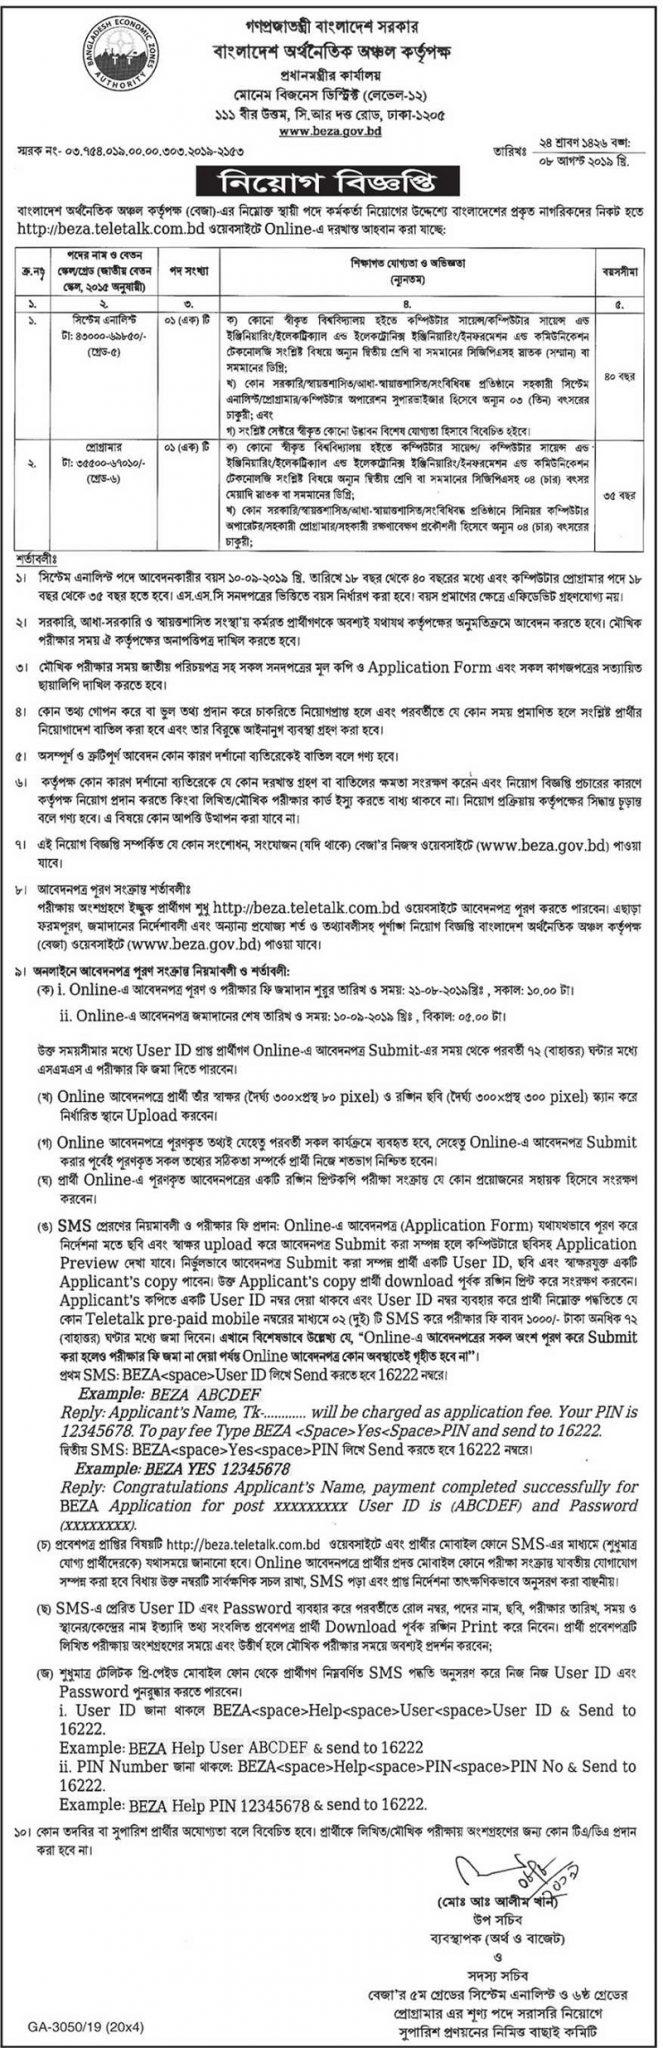 Bangladesh Prime Minister's Office Job Circular 2019